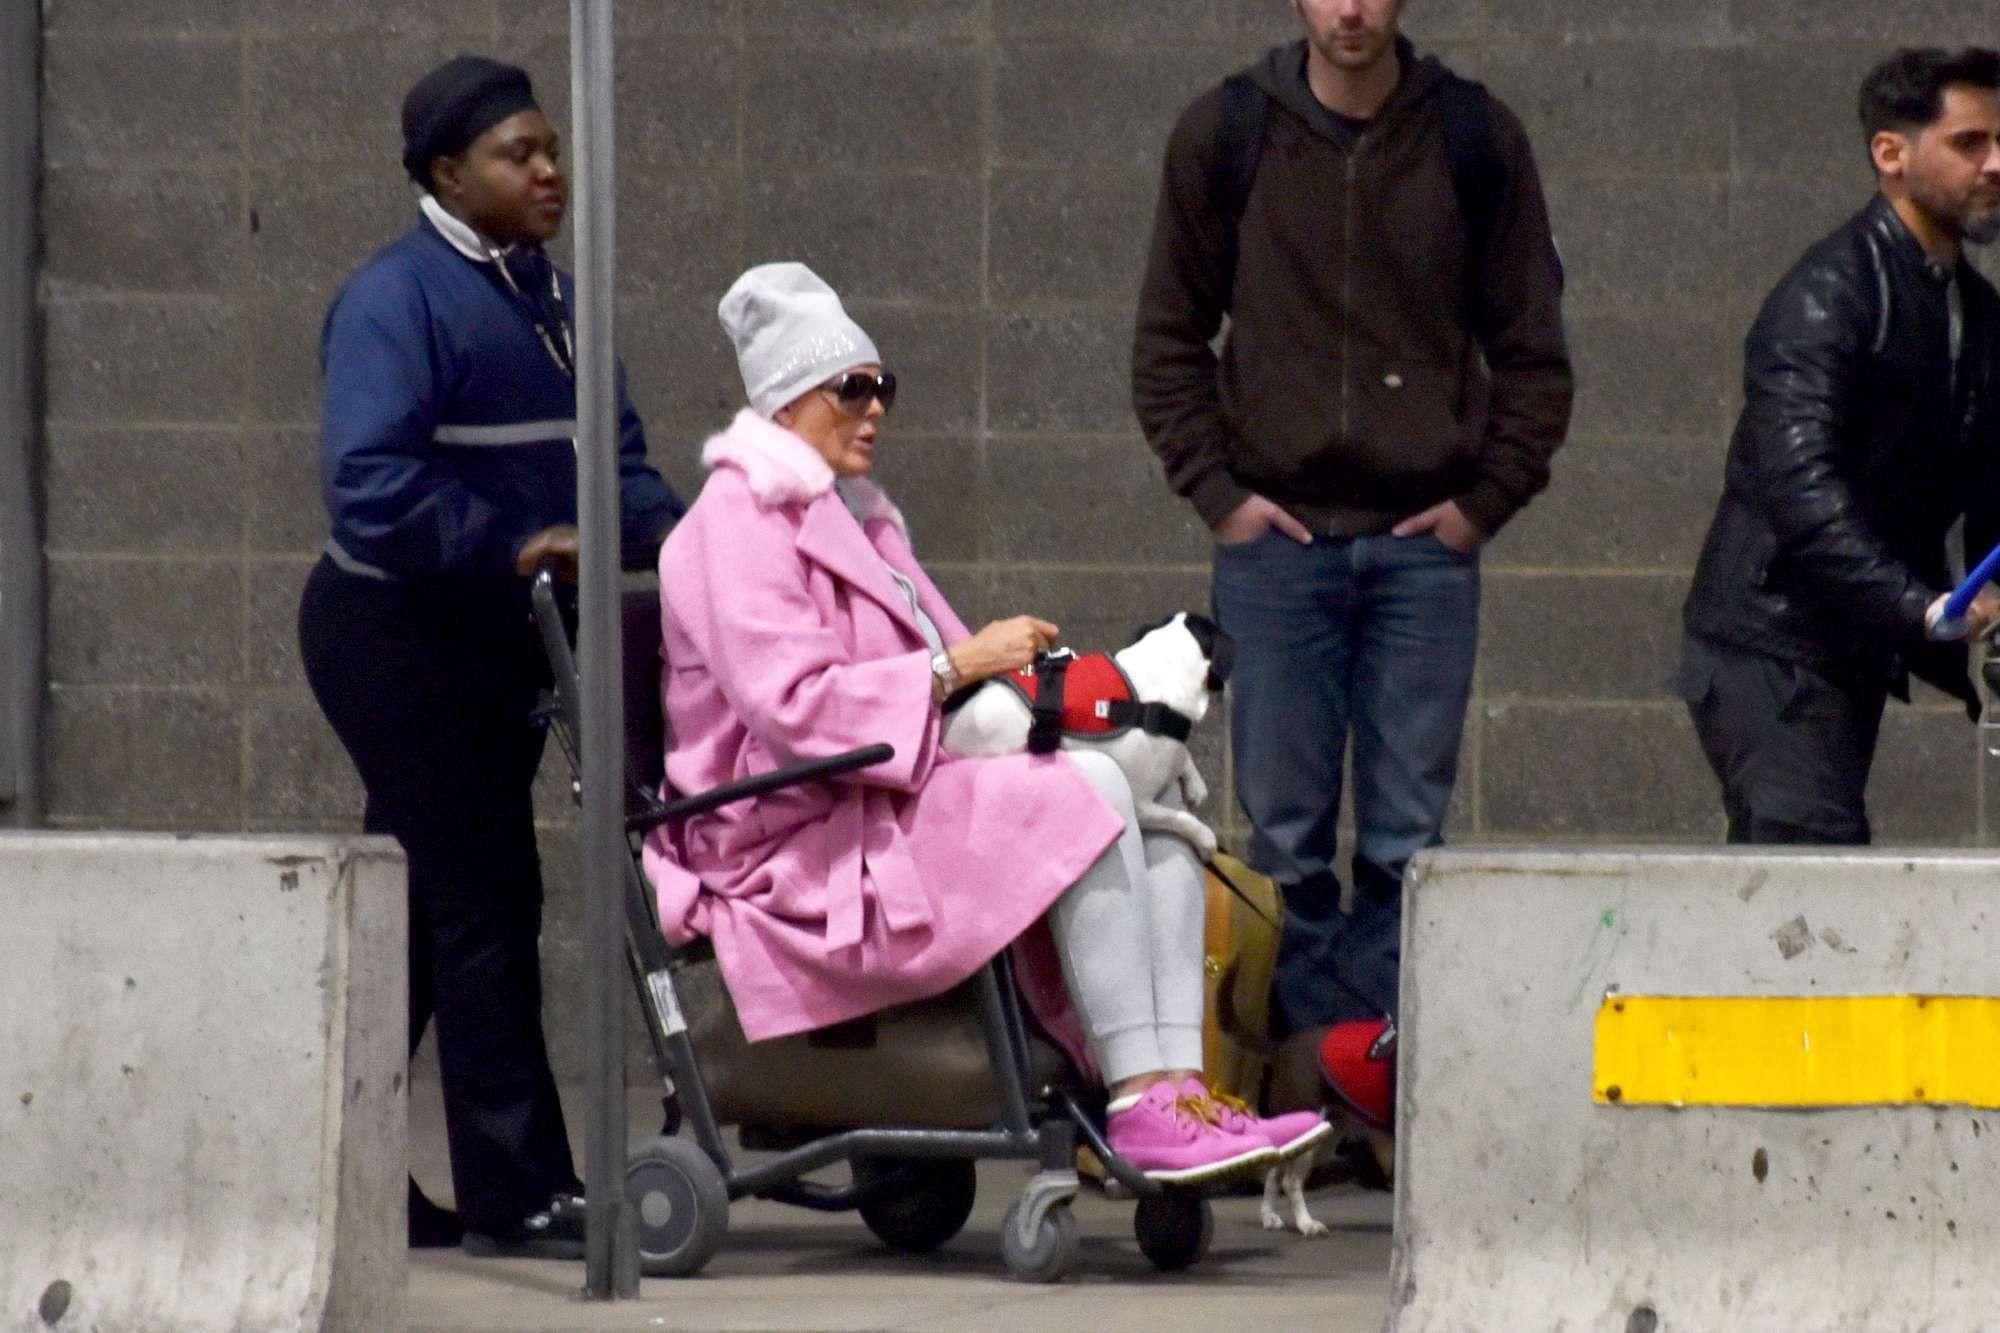 L'attrice Brigitte Nielsen fotografata su una sedia a rotelle